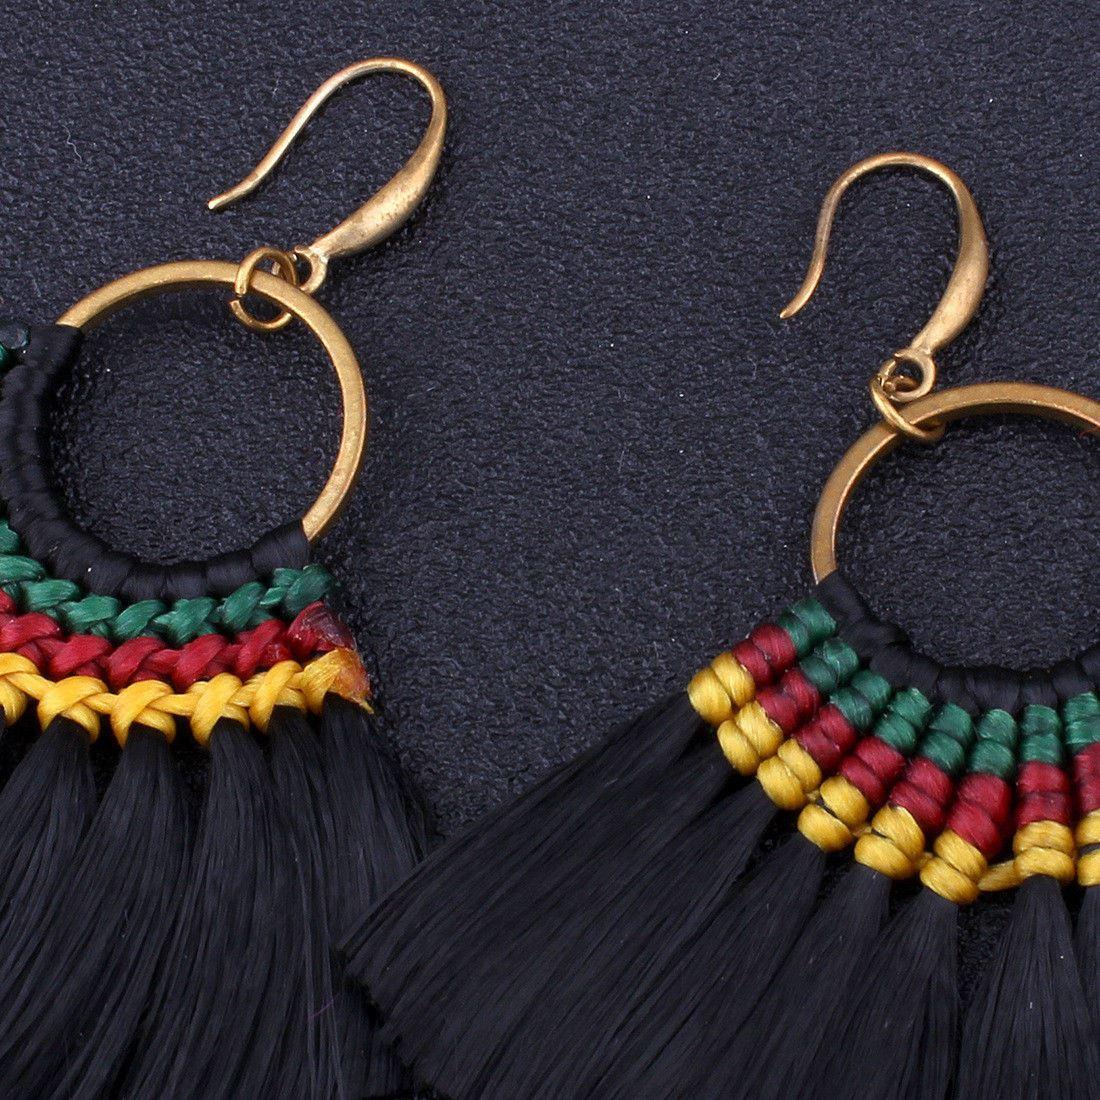 Women-Fashion-Rhinestone-Long-Tassel-Dangle-Earrings-Fringe-Drop-Jewelry-Gift-UK thumbnail 94